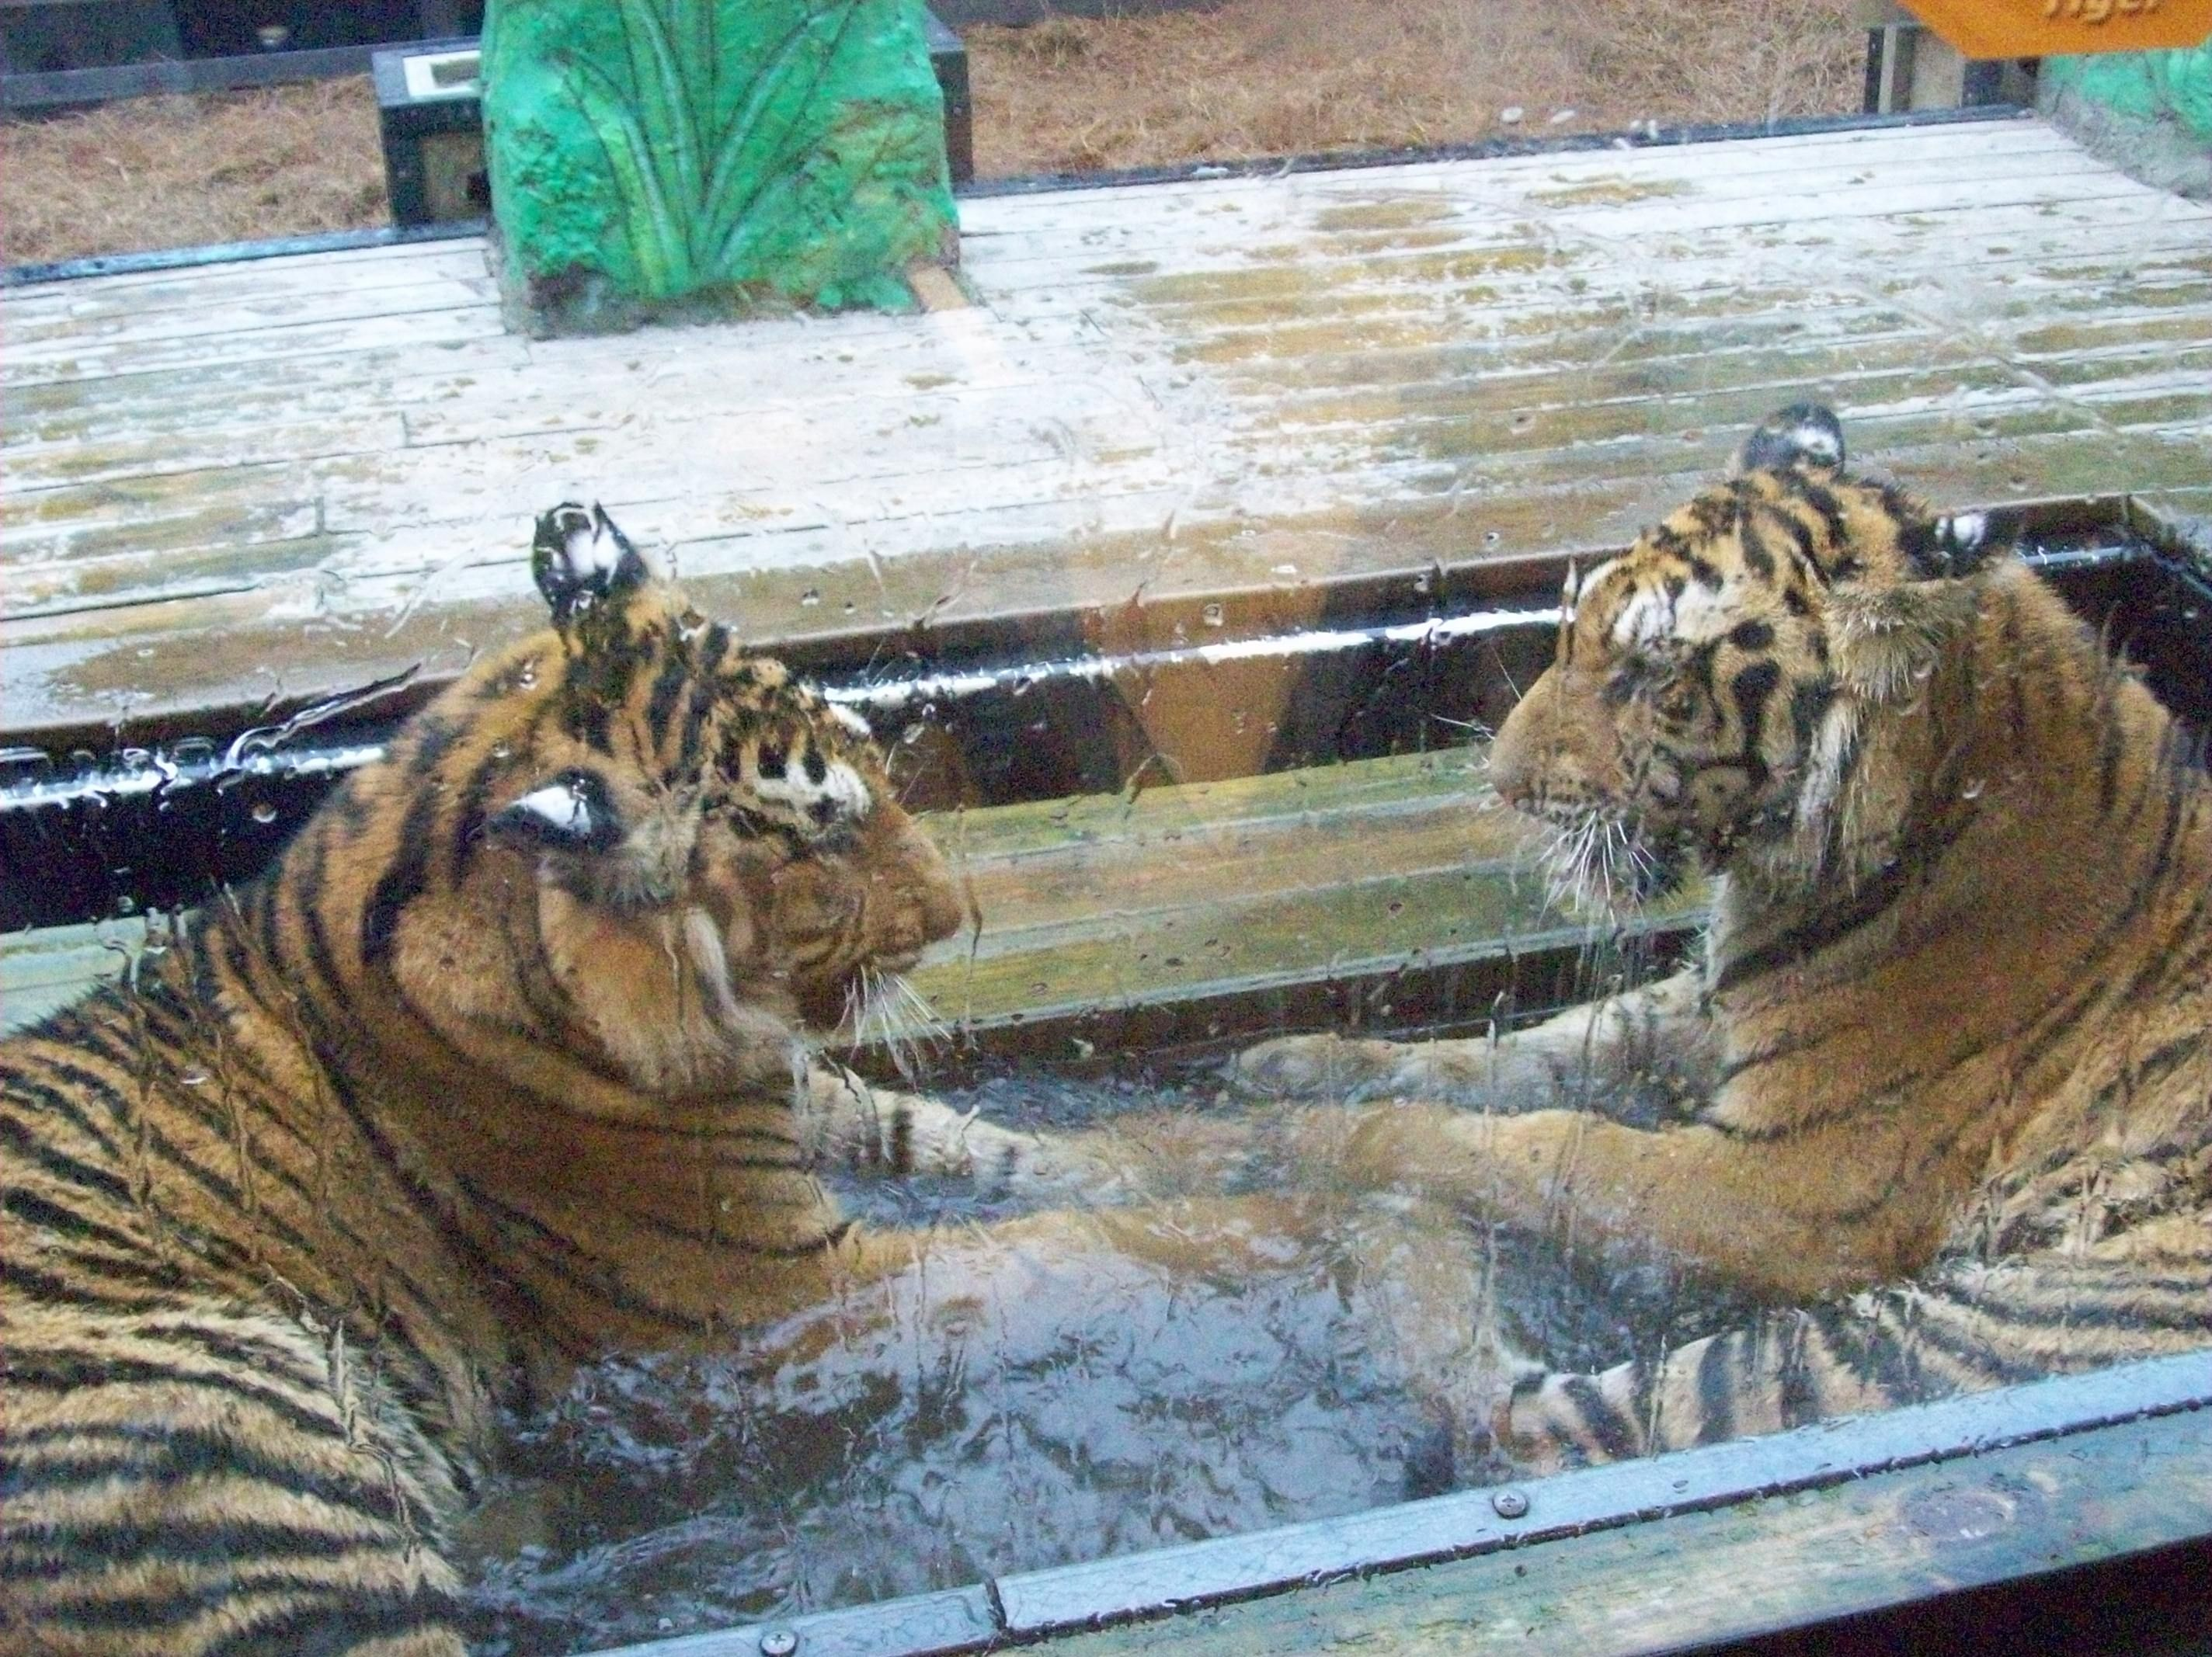 Tigers Preservation Station Myrtle Beach